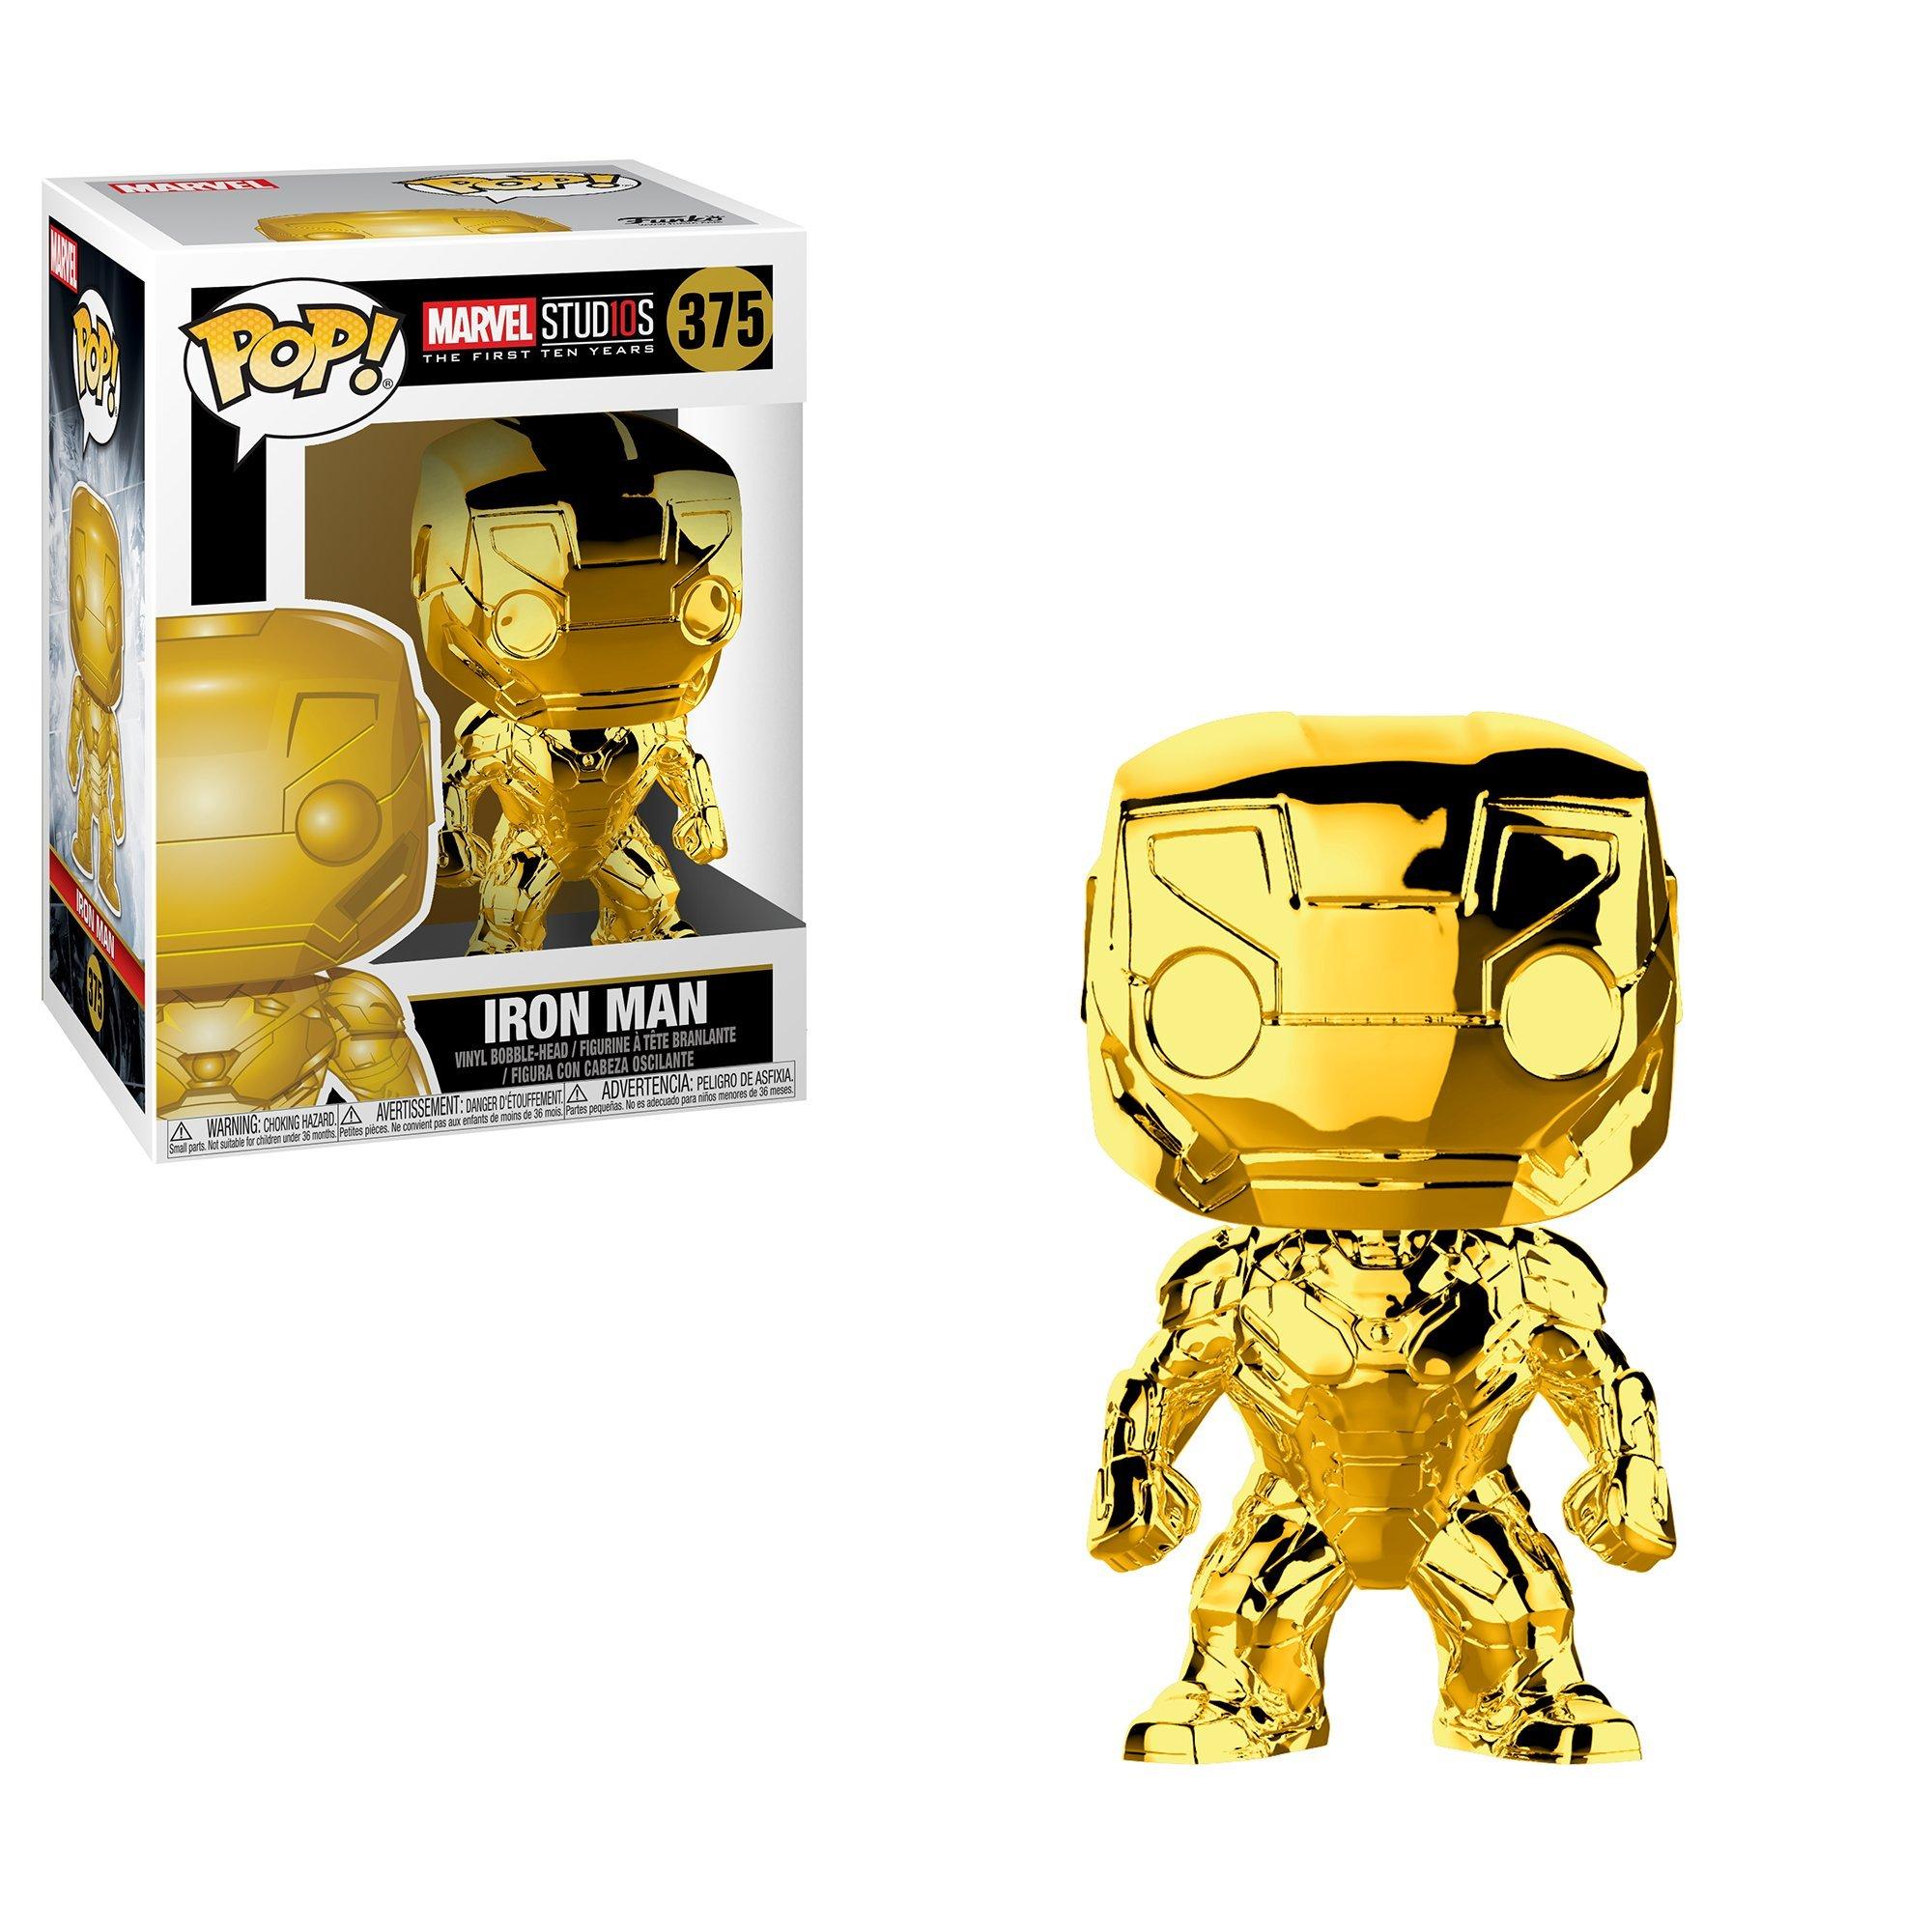 Funko Pop Marvel Studios 10 - Iron Man (Gold Chrome) Collectible Figure, Multicolor by Funko (Image #2)